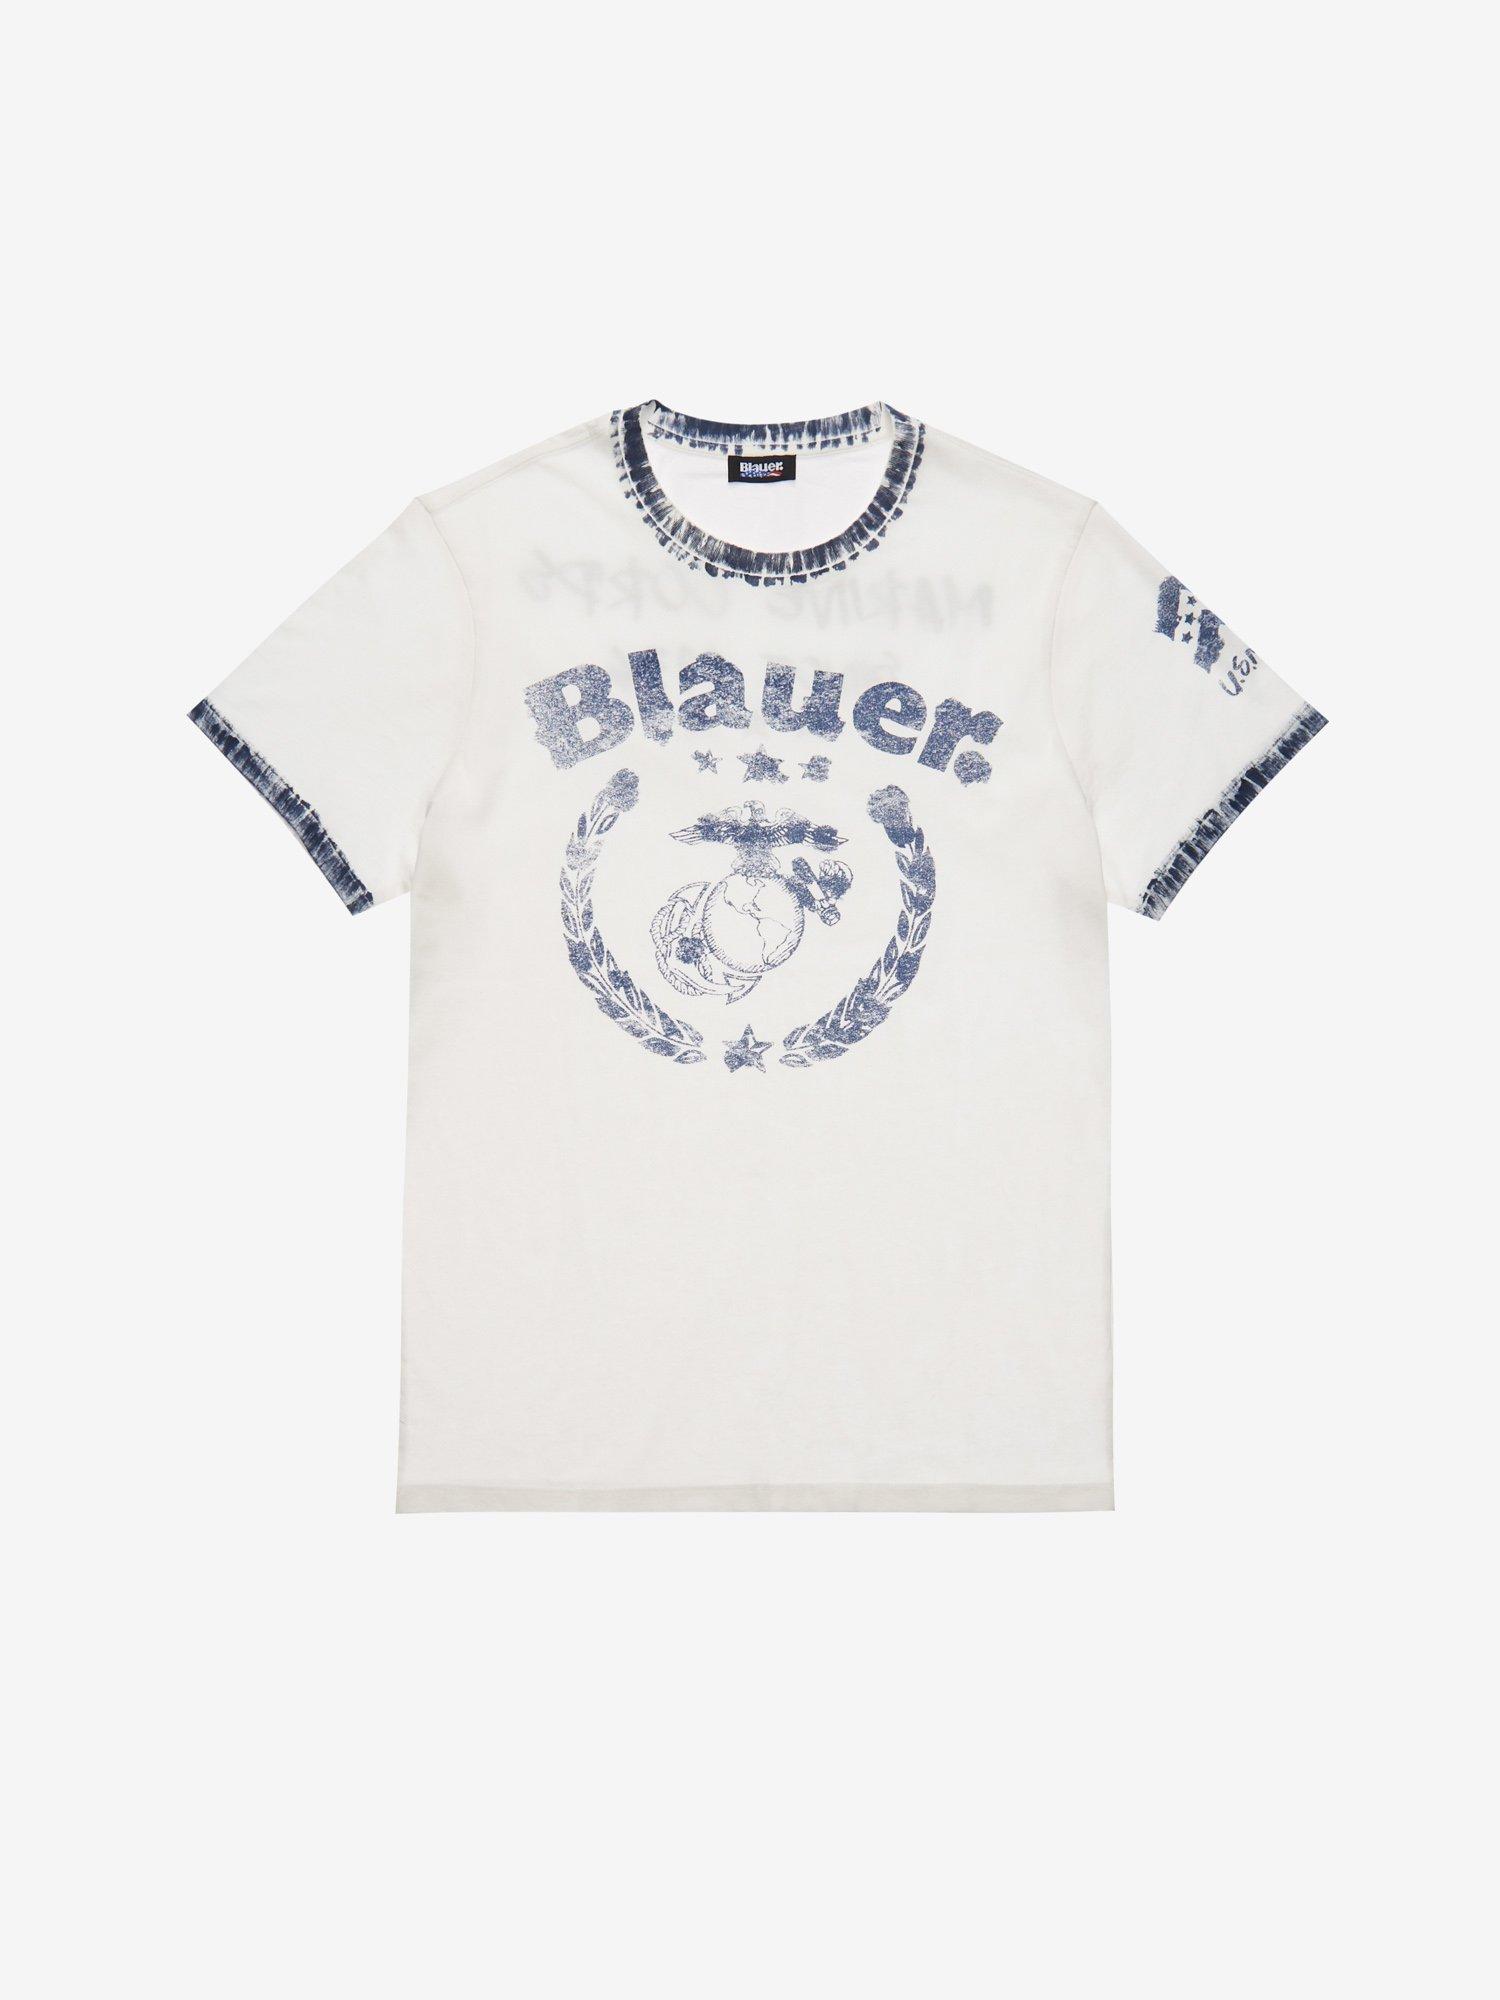 MARINE T-SHIRT - Blauer